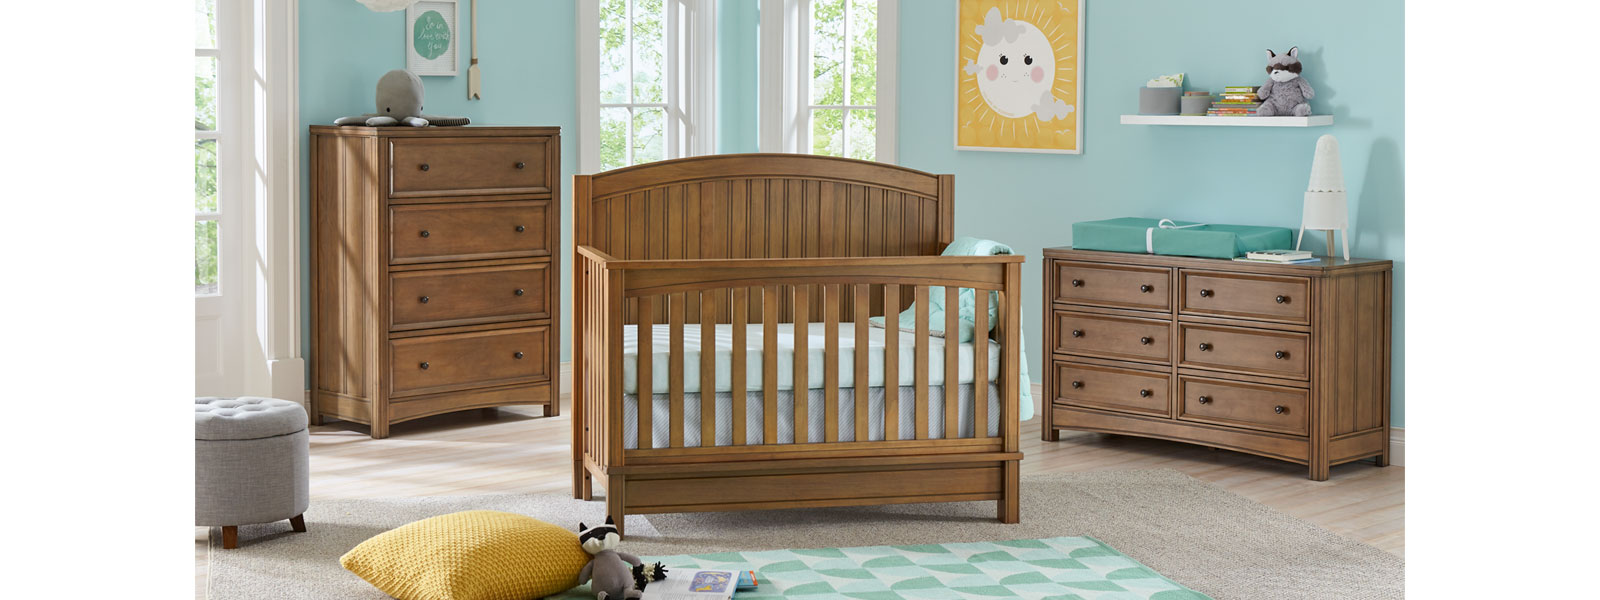 Bristol Convertible Crib Full Size Bed Rails Convertible Crib